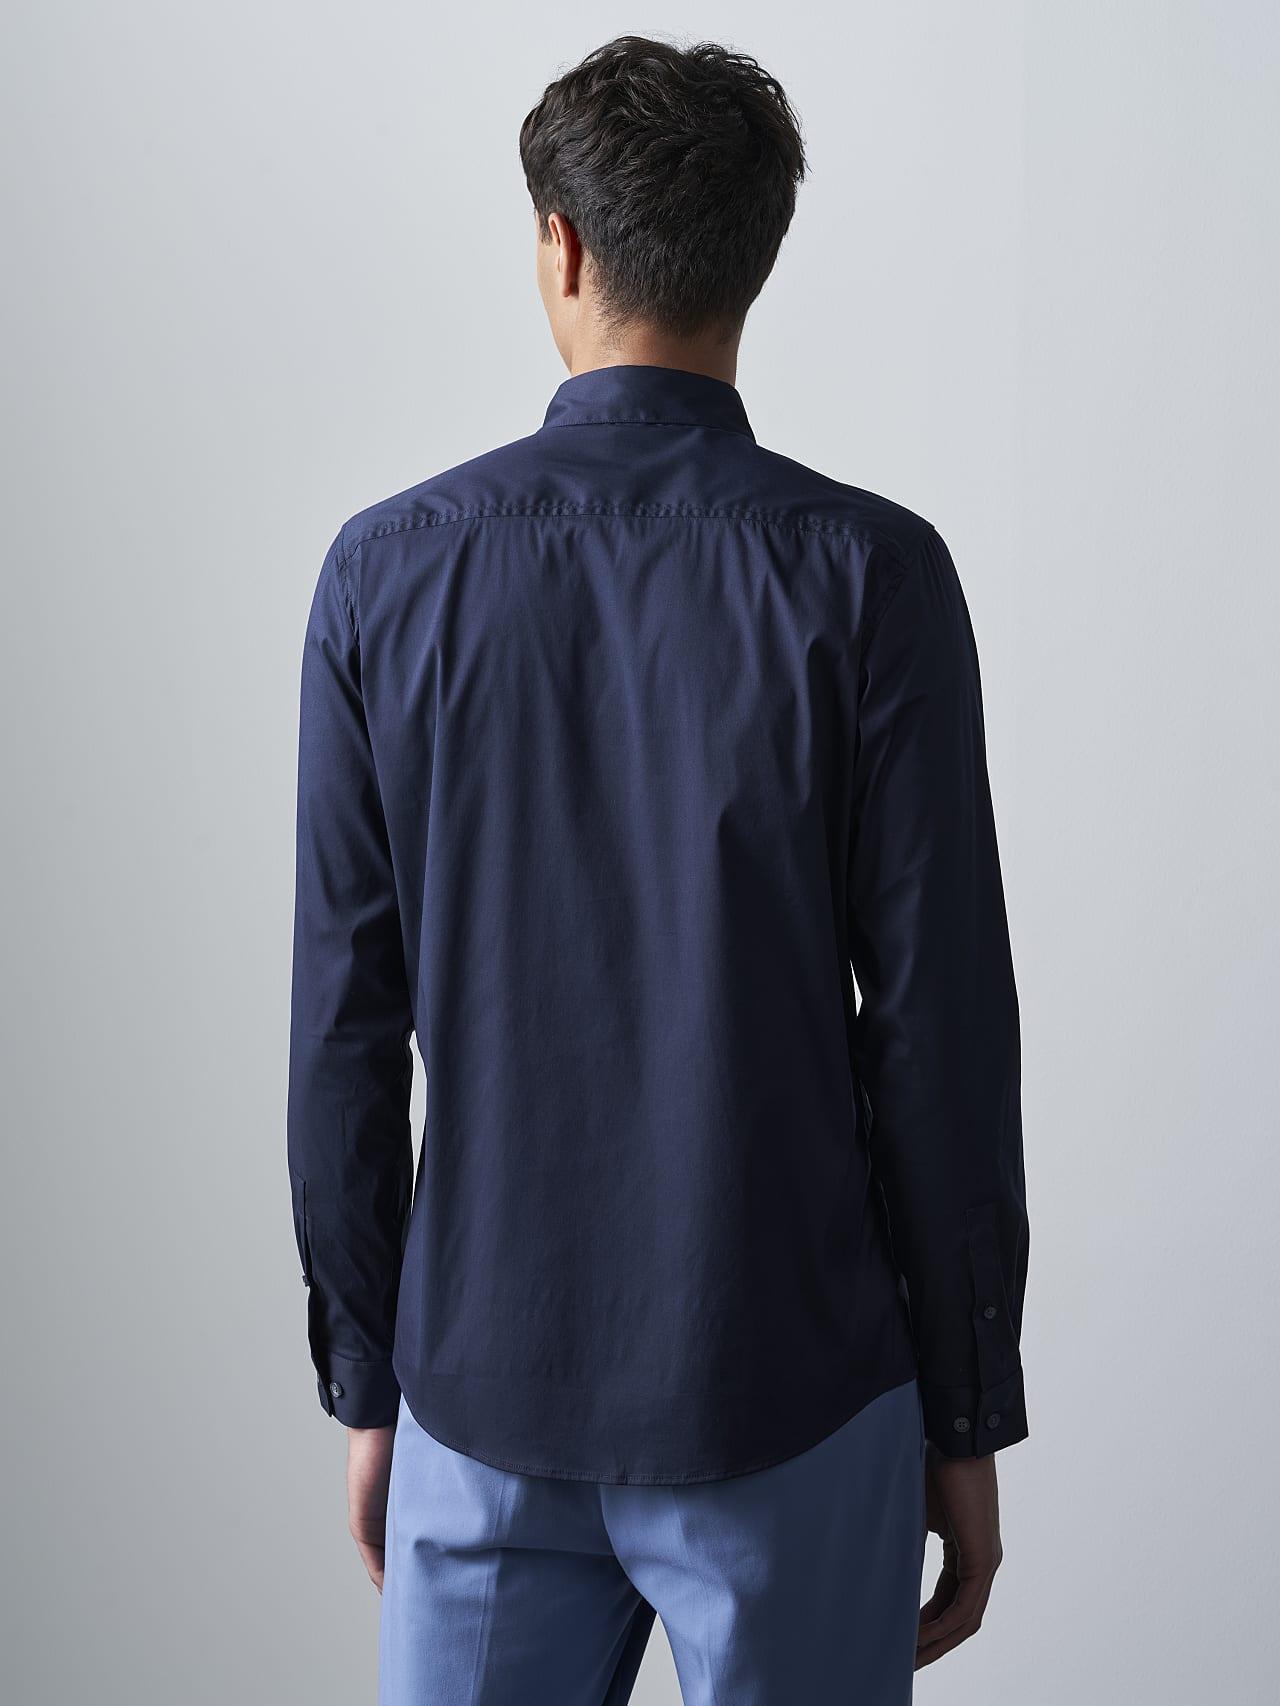 WAARG V2.Y5.02 Easy-Care Cotton Shirt navy Front Main Alpha Tauri